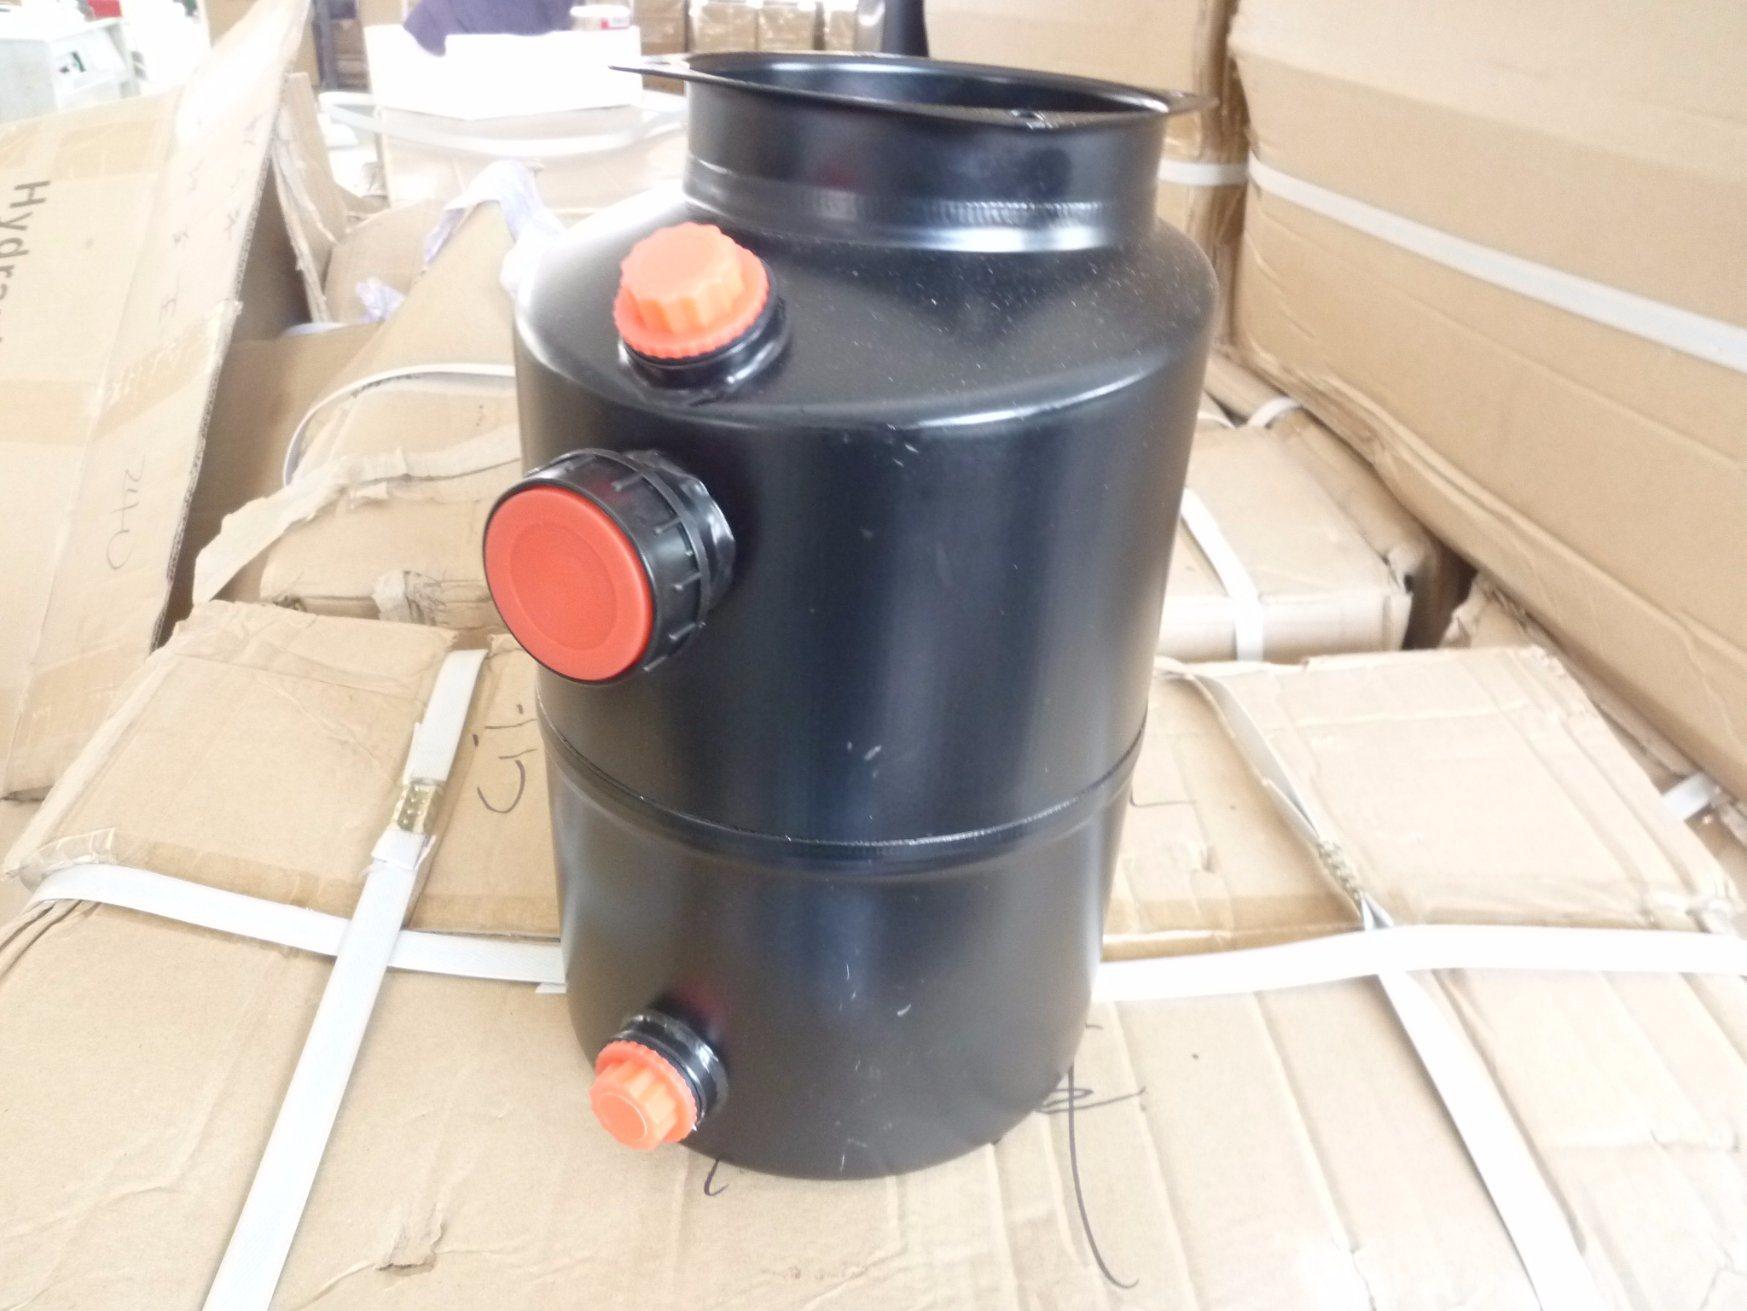 12V DC Hydraulic Tipper Power Unit Lift 2.5 Tonne